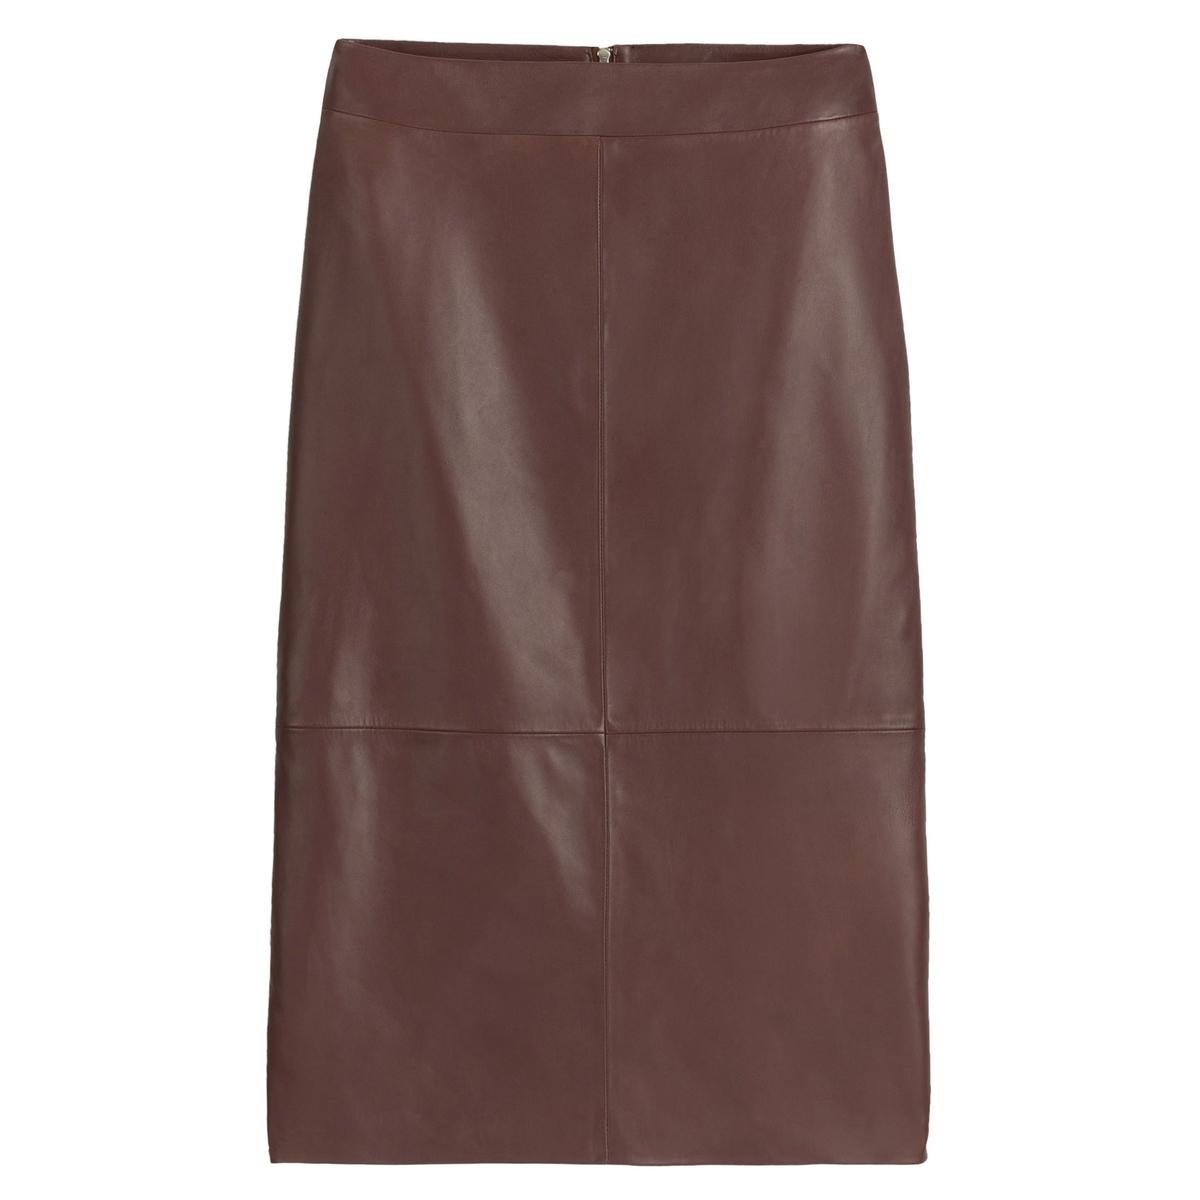 Falda tubo de piel, semilarga